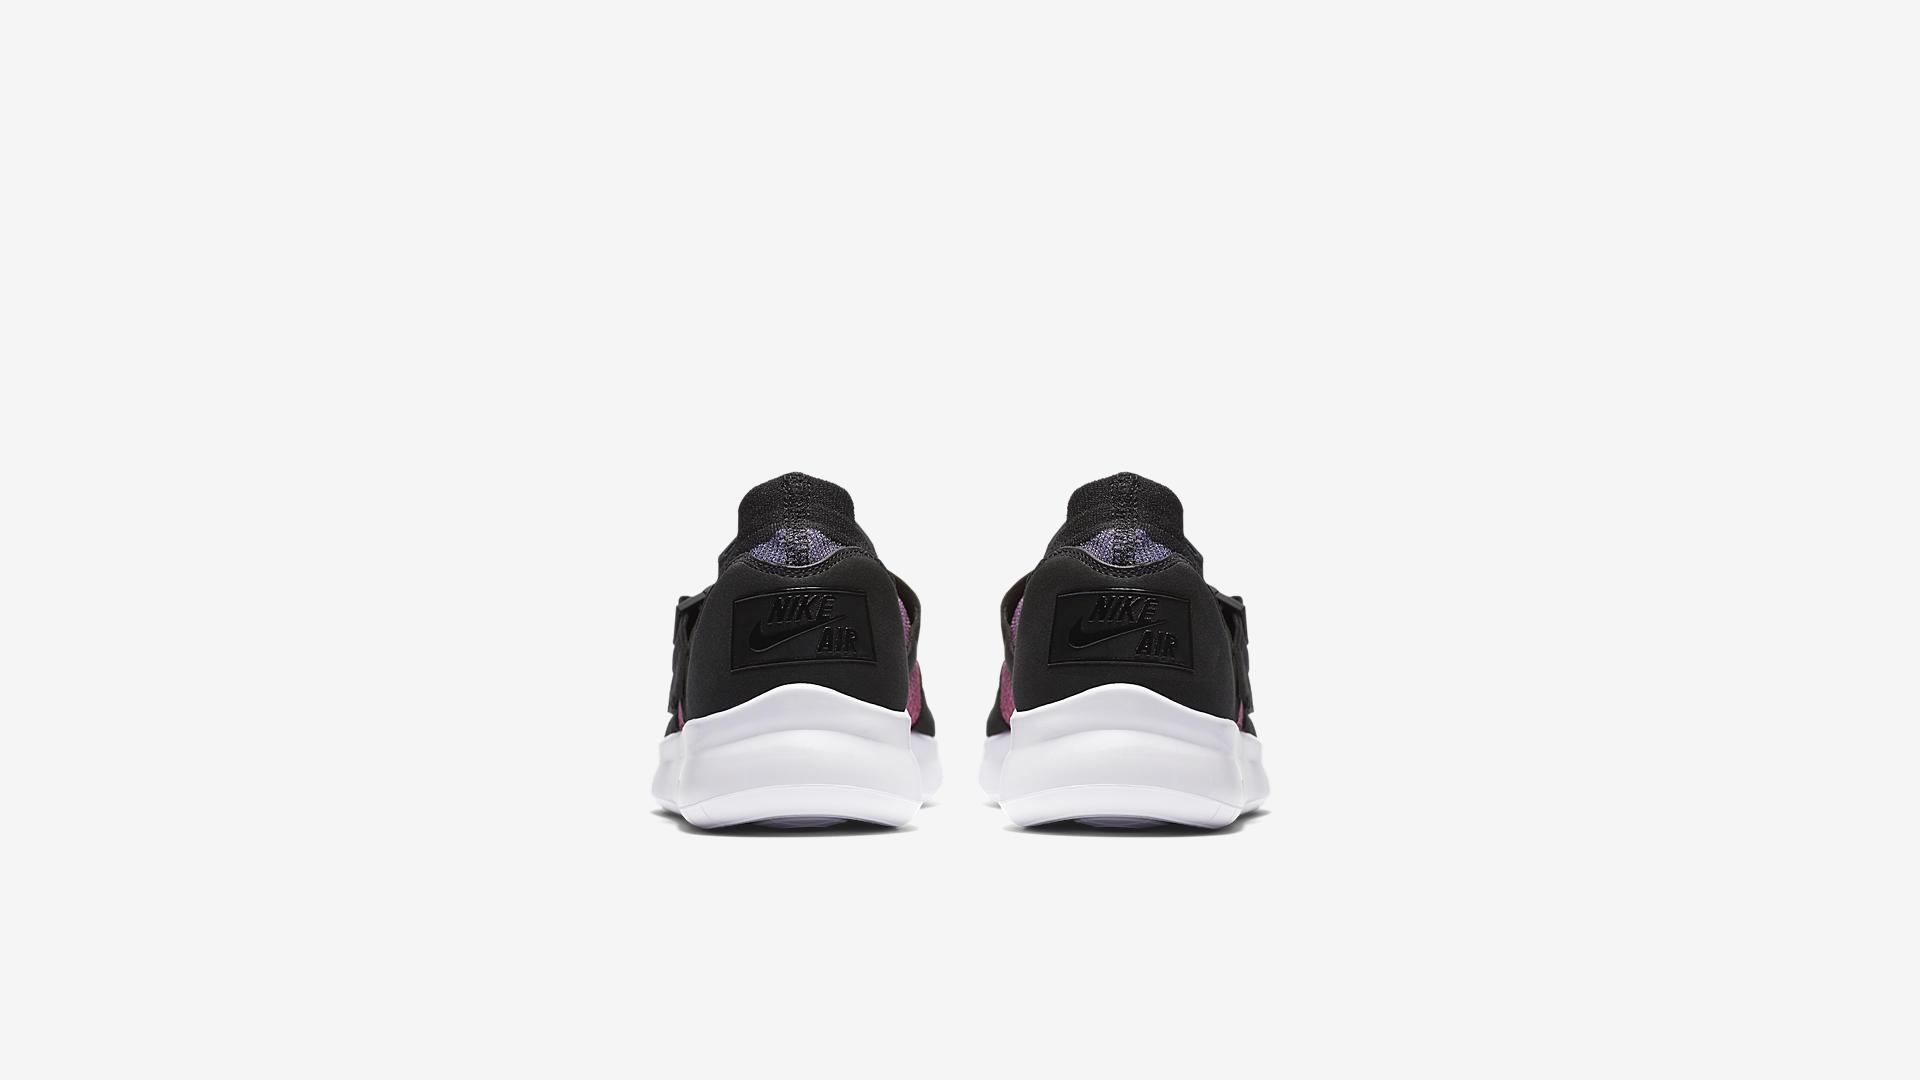 Nike Air Sock Racer Ultra Flyknit Premium Rainbow 898021 700 2